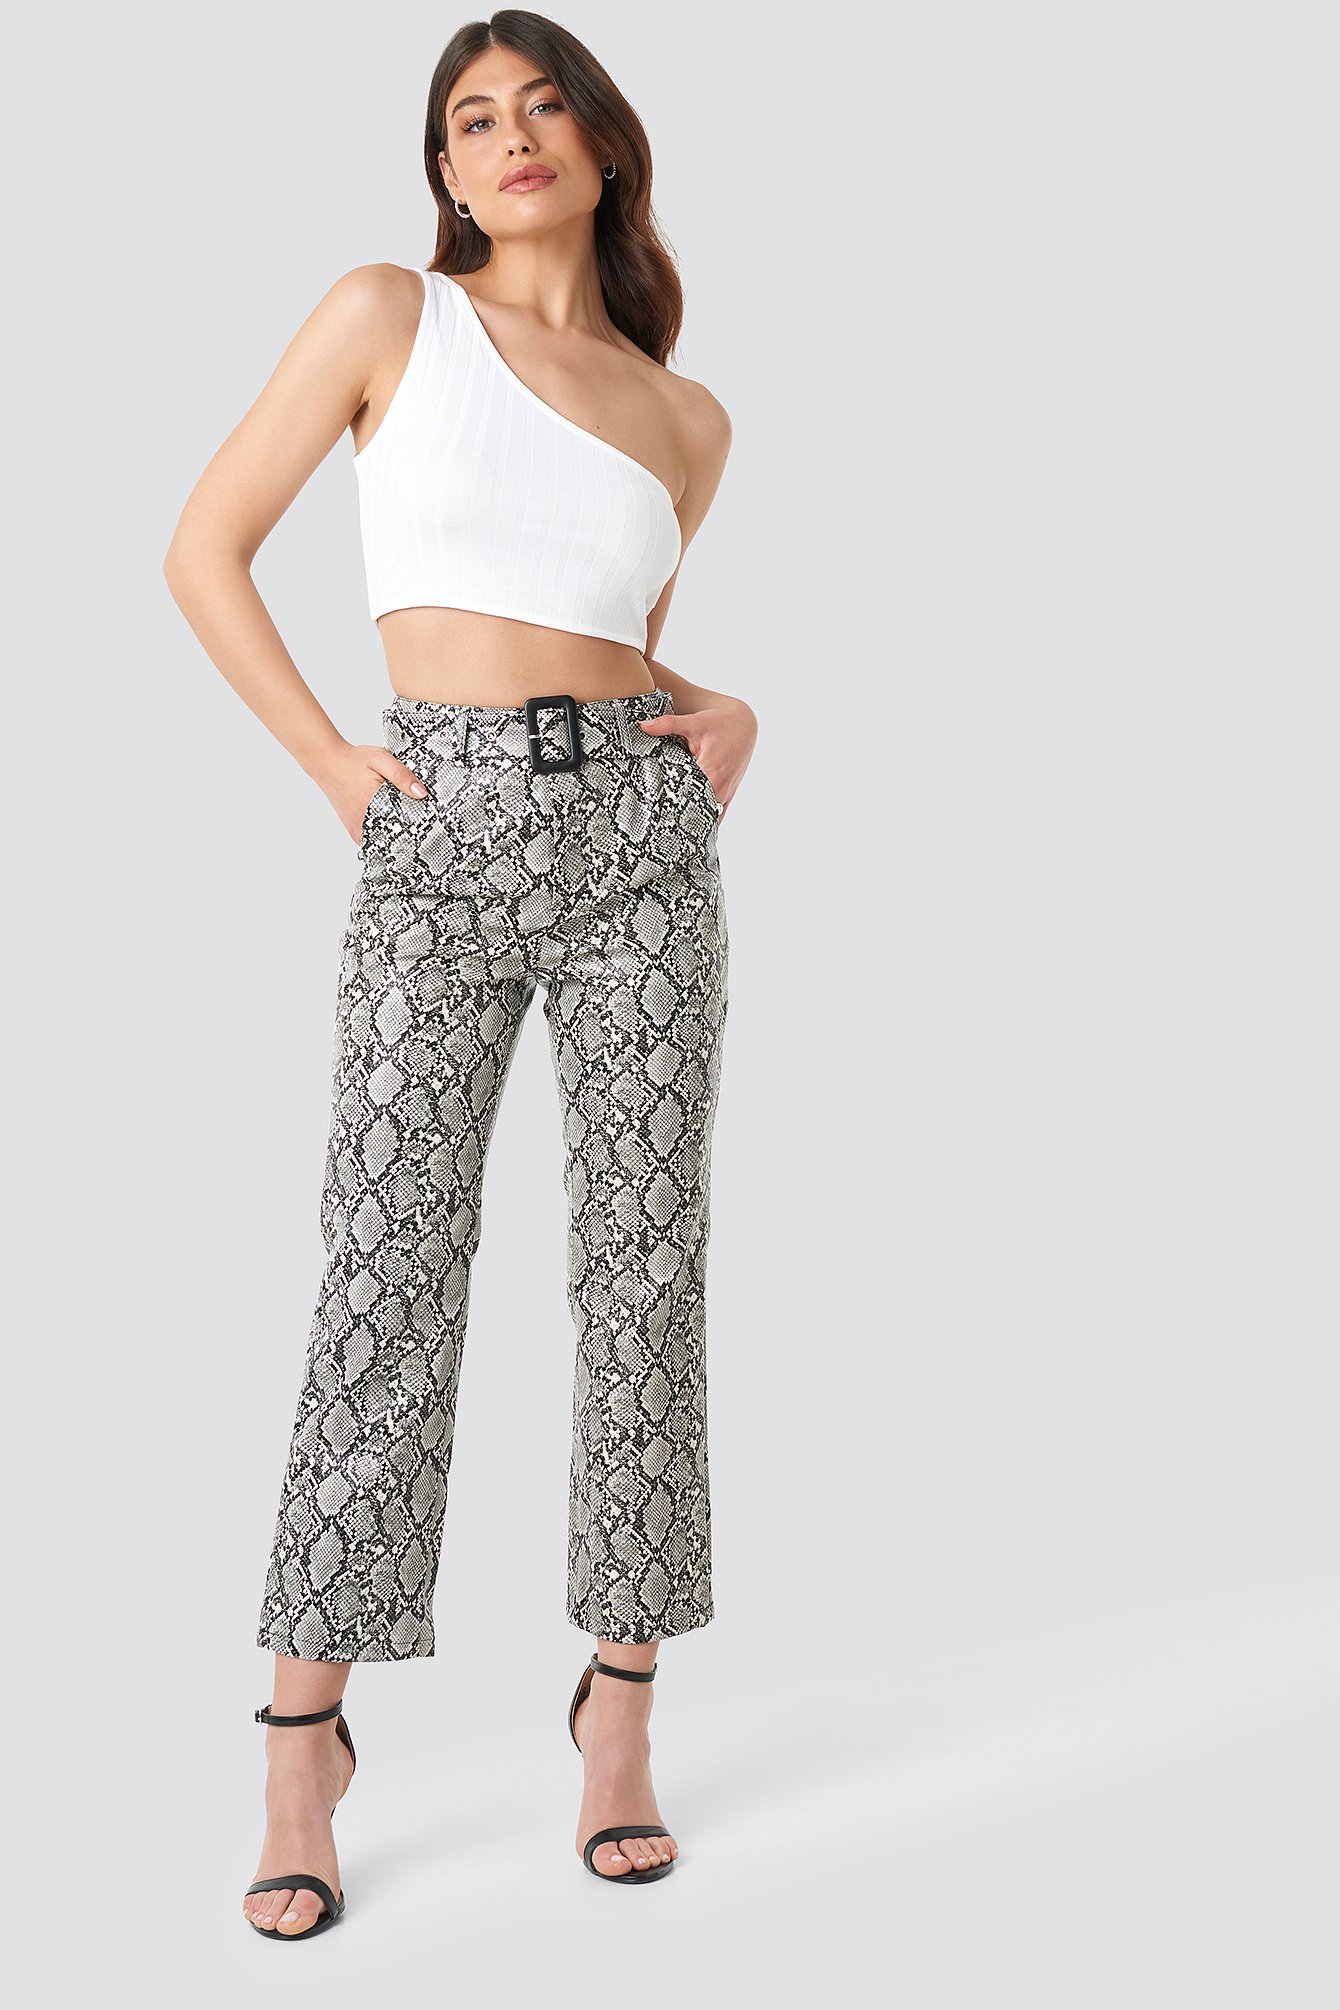 linn ahlborg x na-kd -  Snake Printed Cropped PU Pants - Multicolor